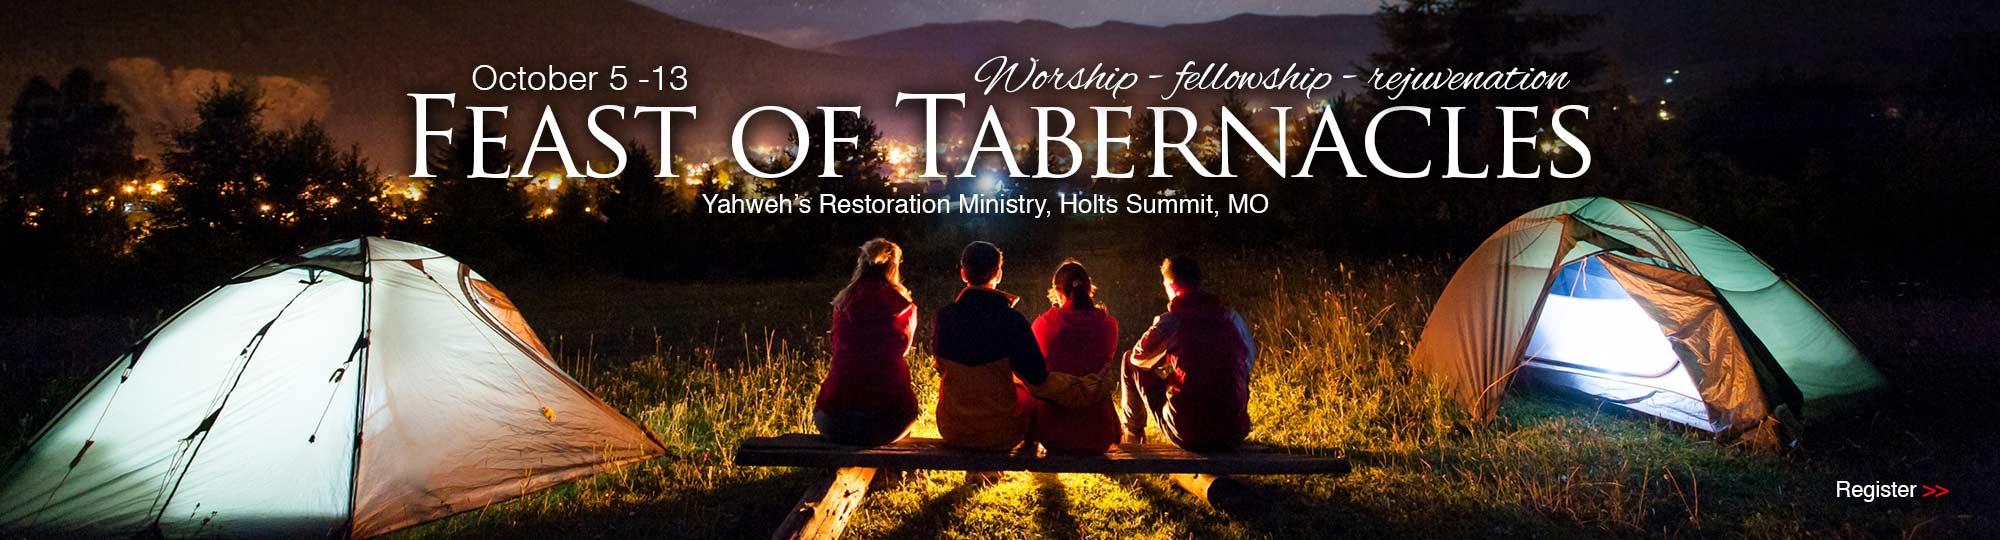 YRM.org - Yahweh's Restoration Ministry